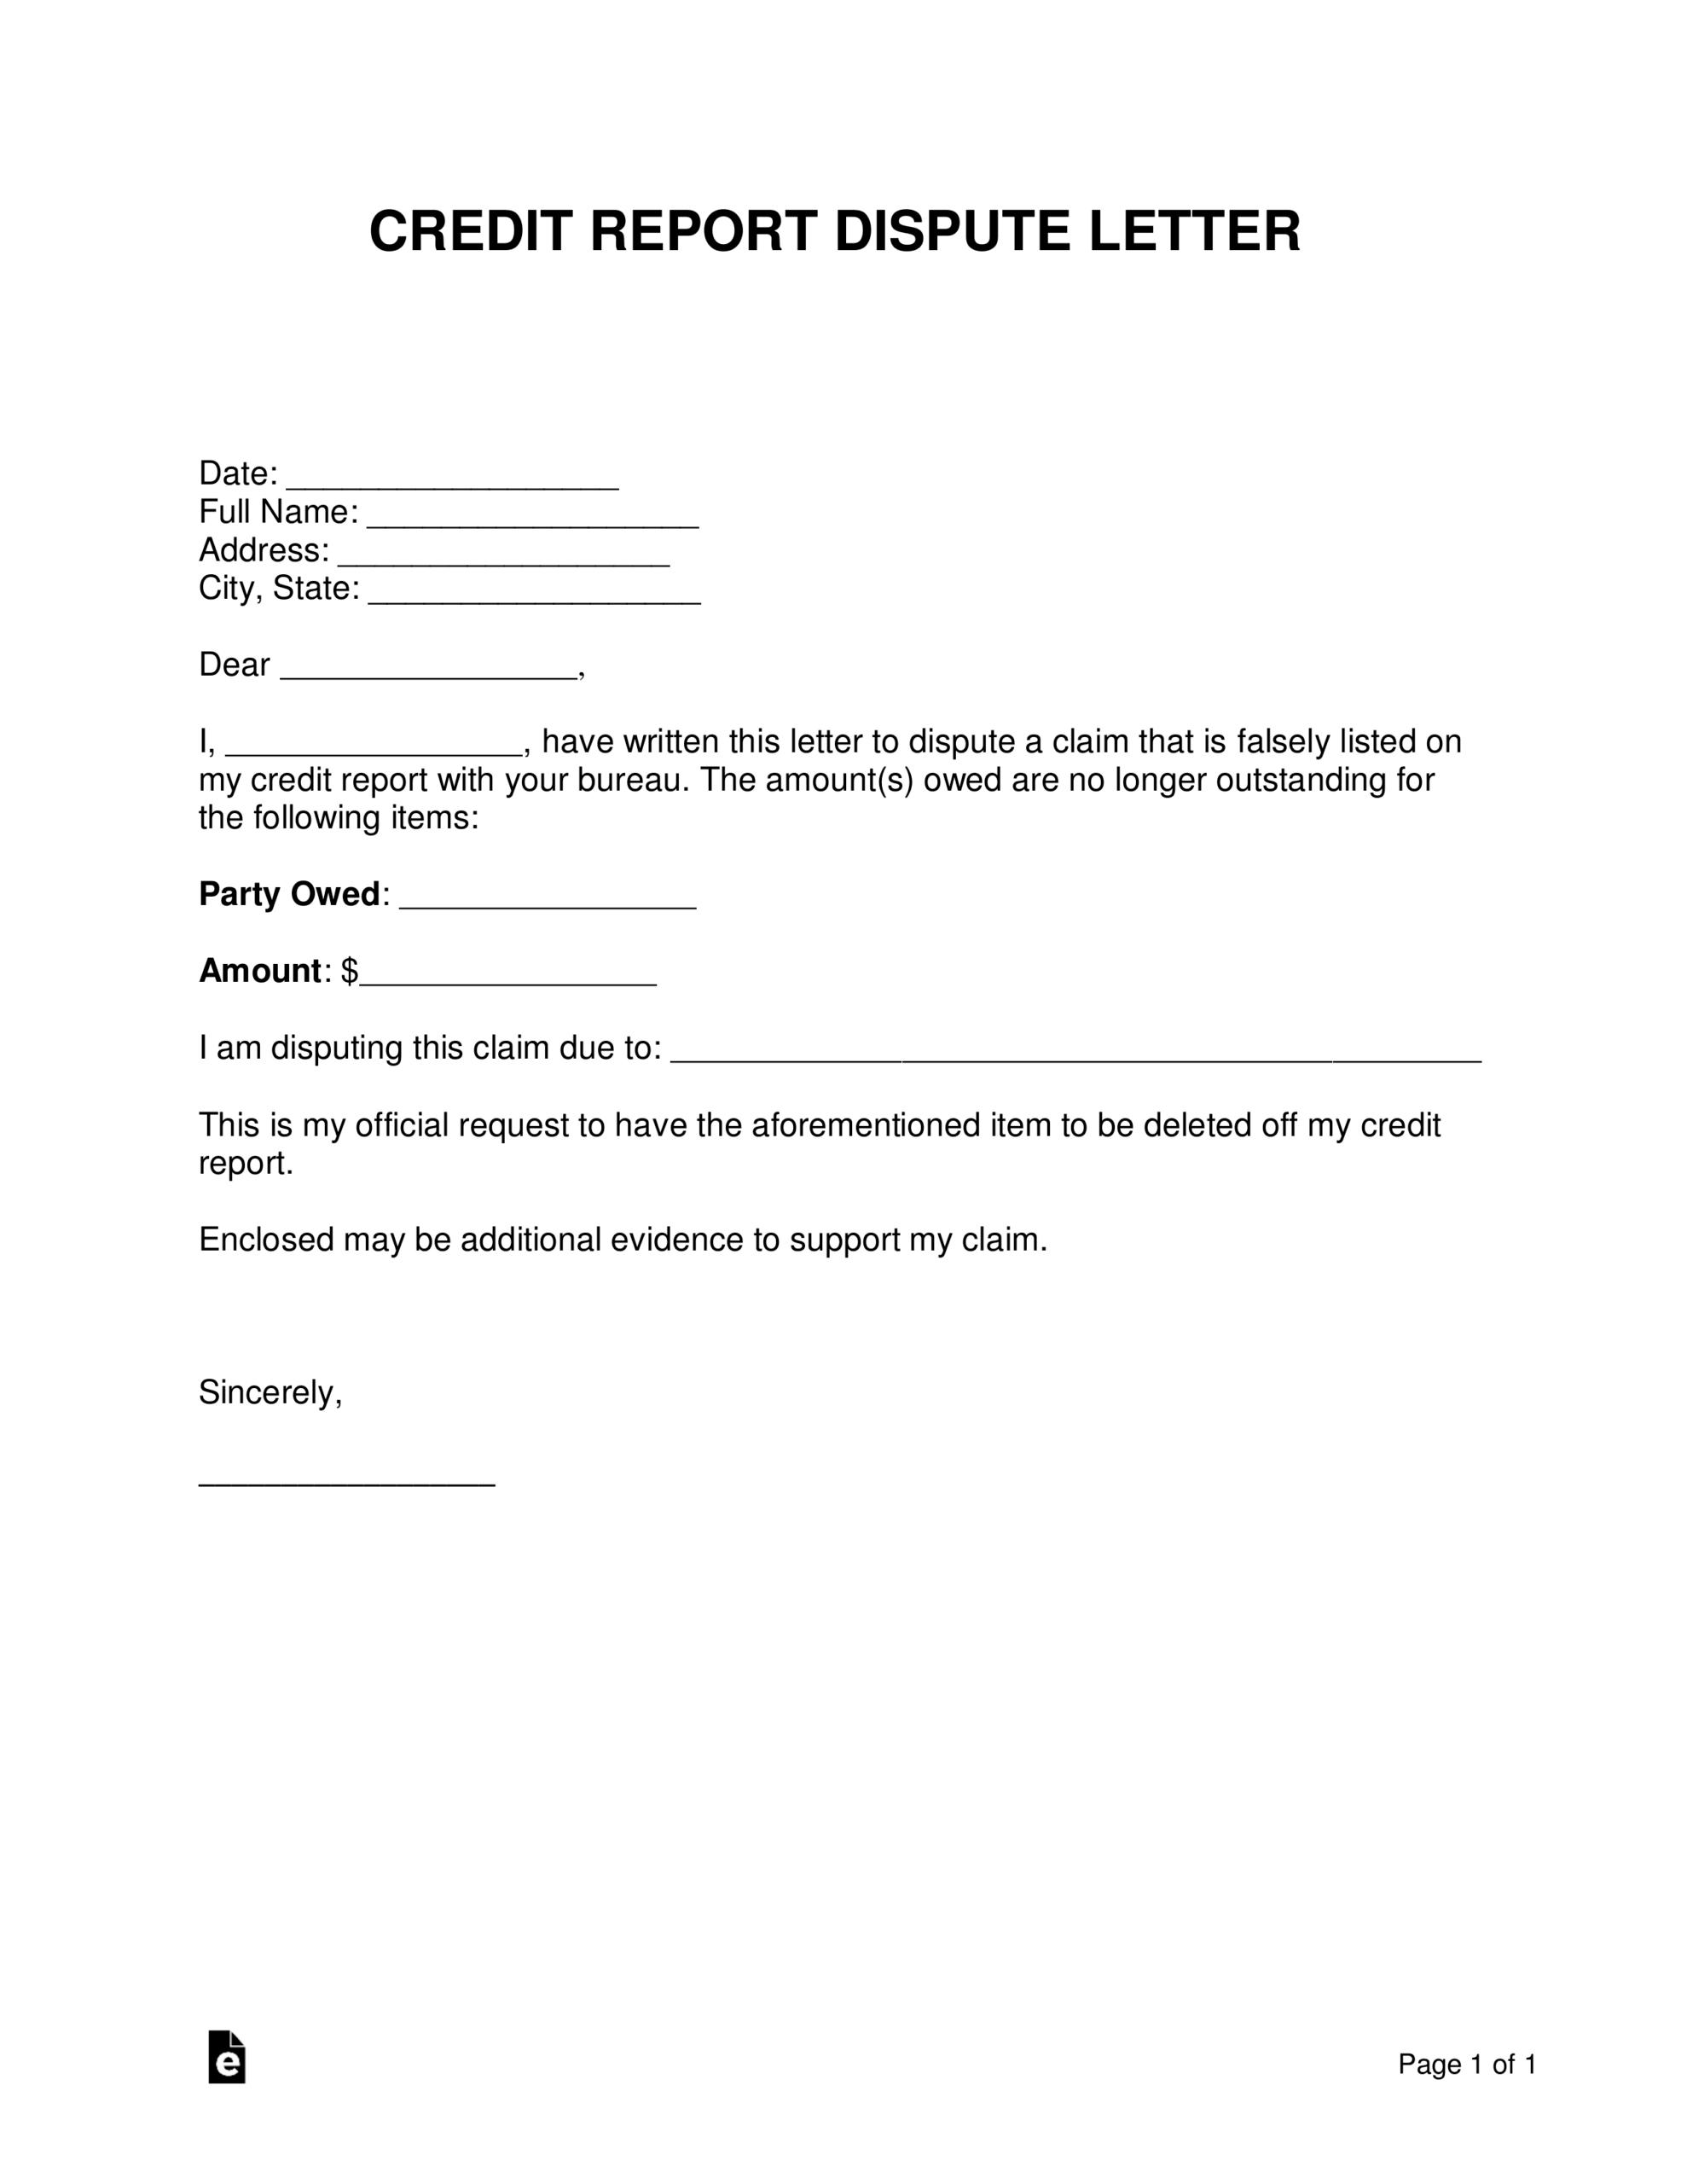 Free Credit Report Dispute Letter Template - Sample - Word For 609 Dispute Letter Template